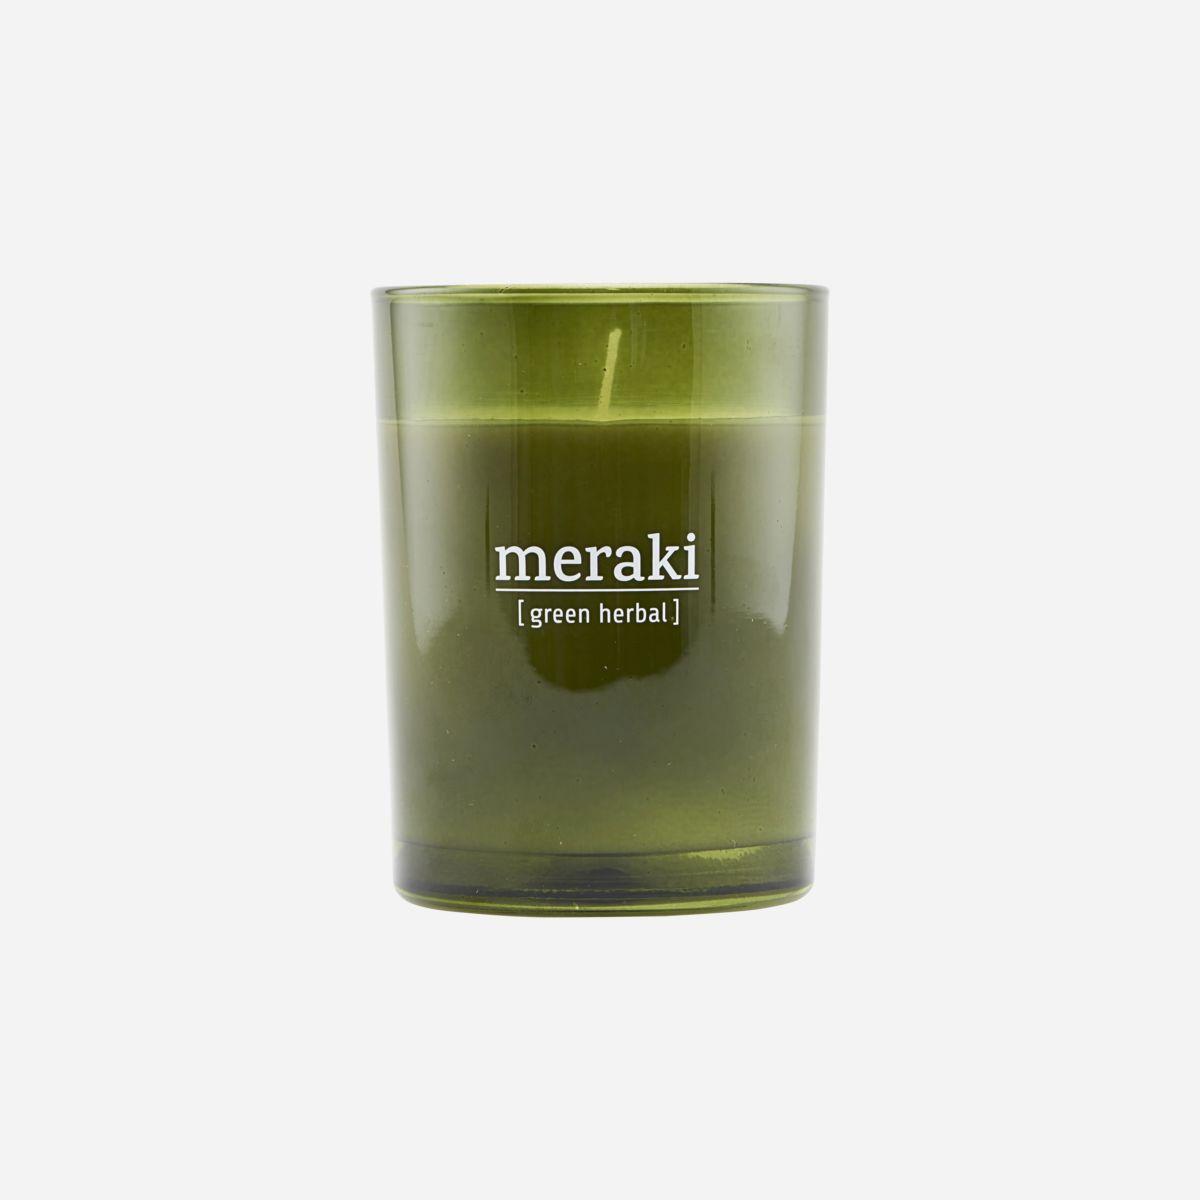 Meraki - Duftlys, green herbal, 220g